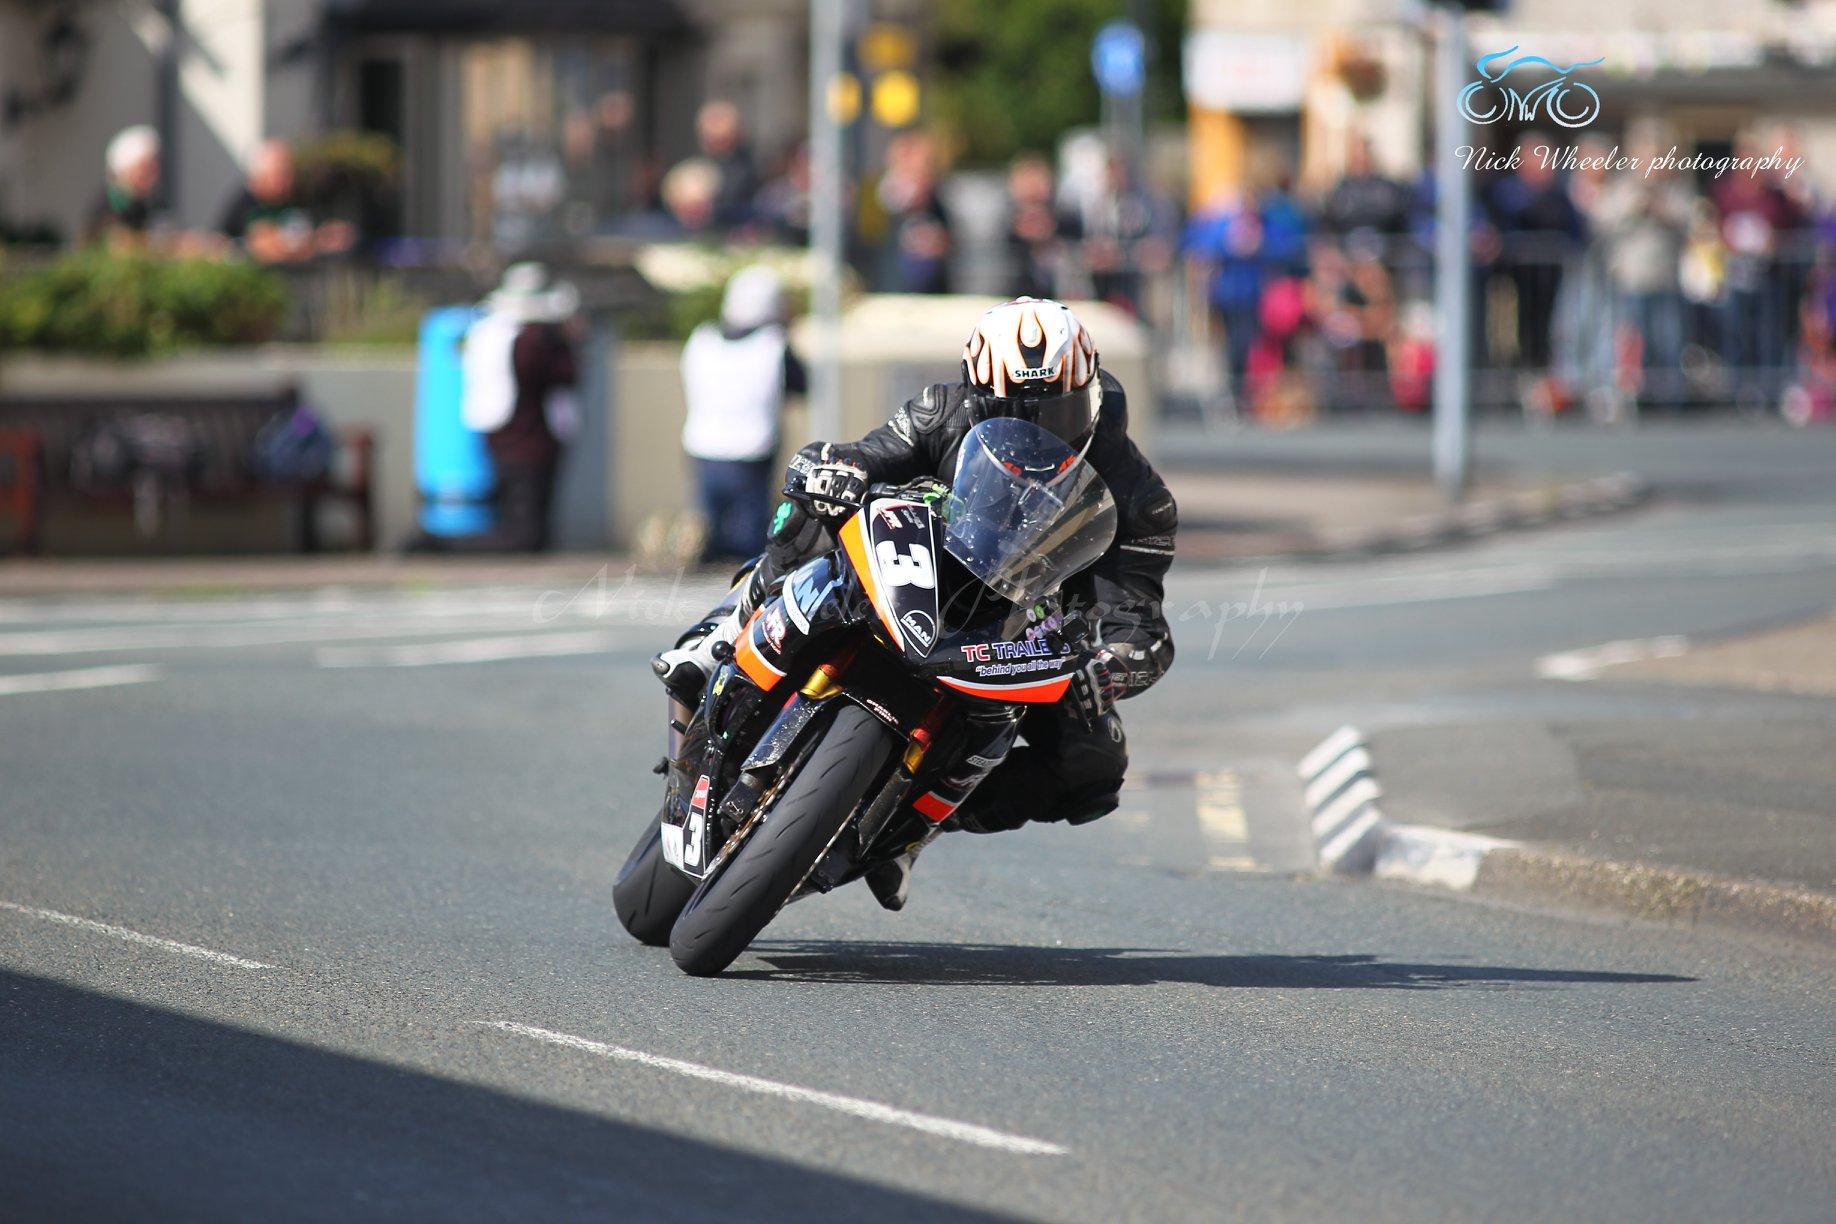 Farrell Calls Time On Prodigious Manx GP Career